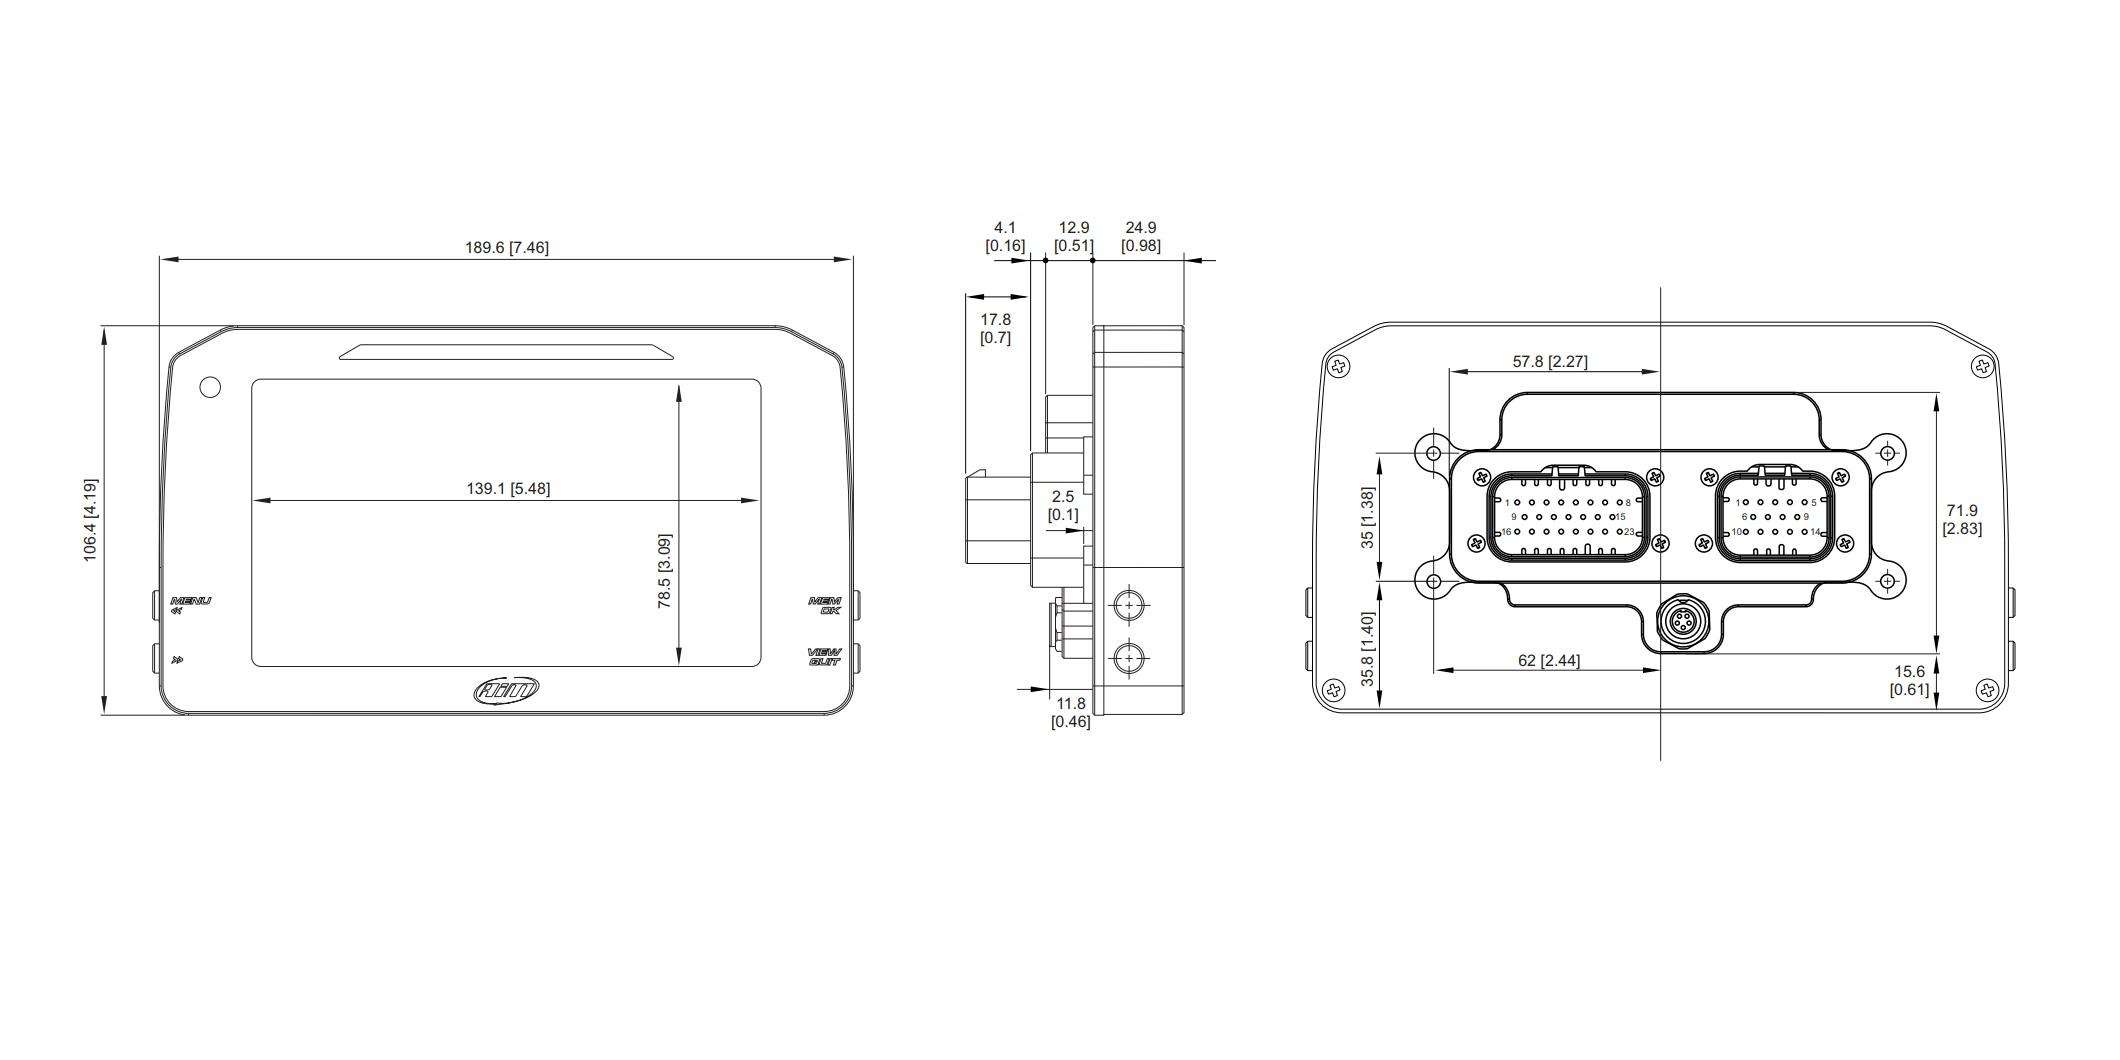 AIM MXP Strada Digital Dash Dimensions - Without Icons